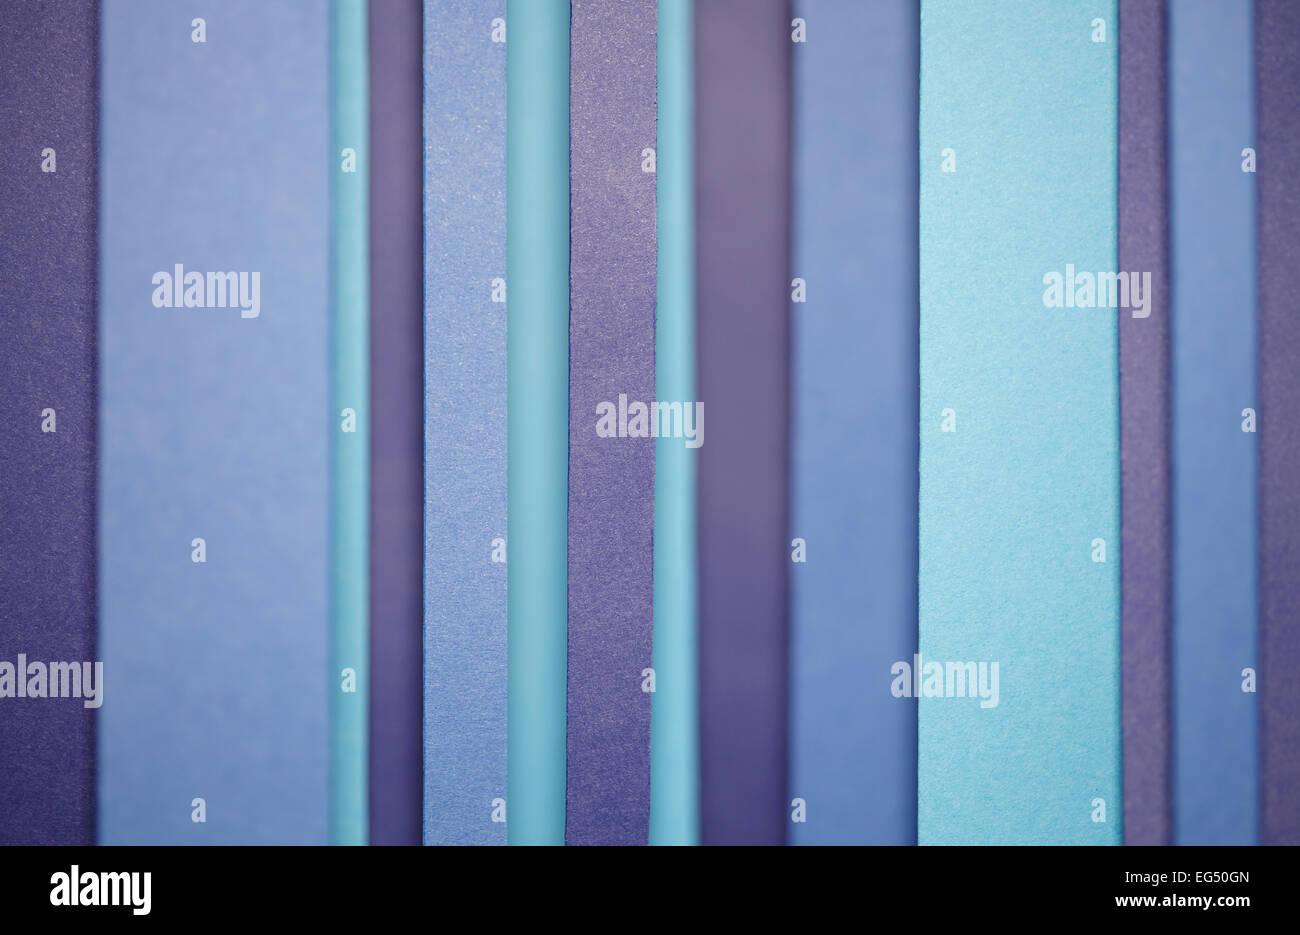 Download 760+ Background Hijau Strip HD Terbaik